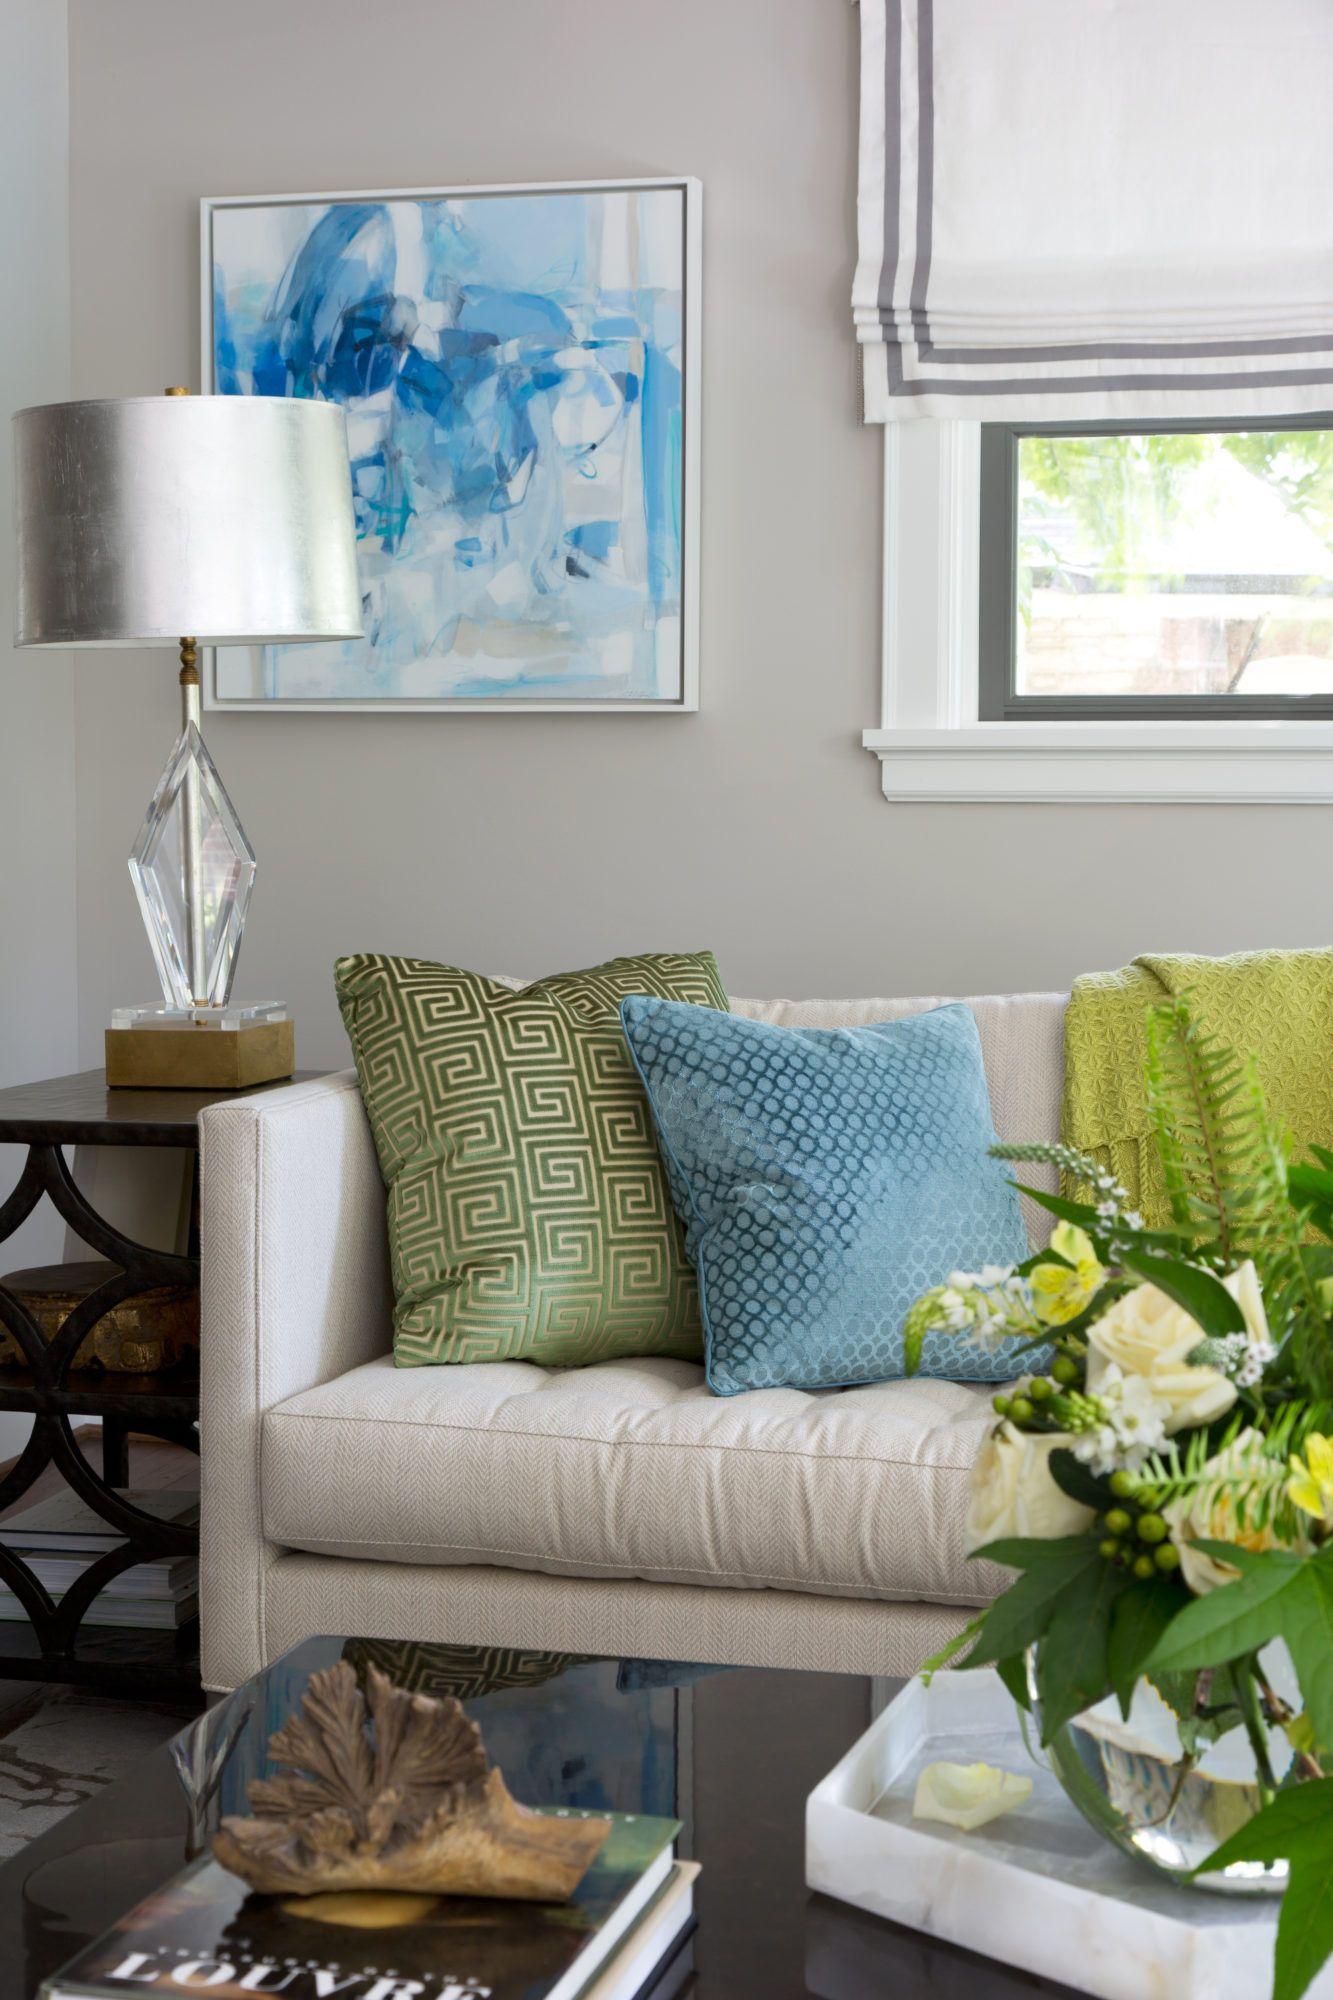 Laura Lee Home - St. Louis Interior Design. Fresh, Polished & Pretty